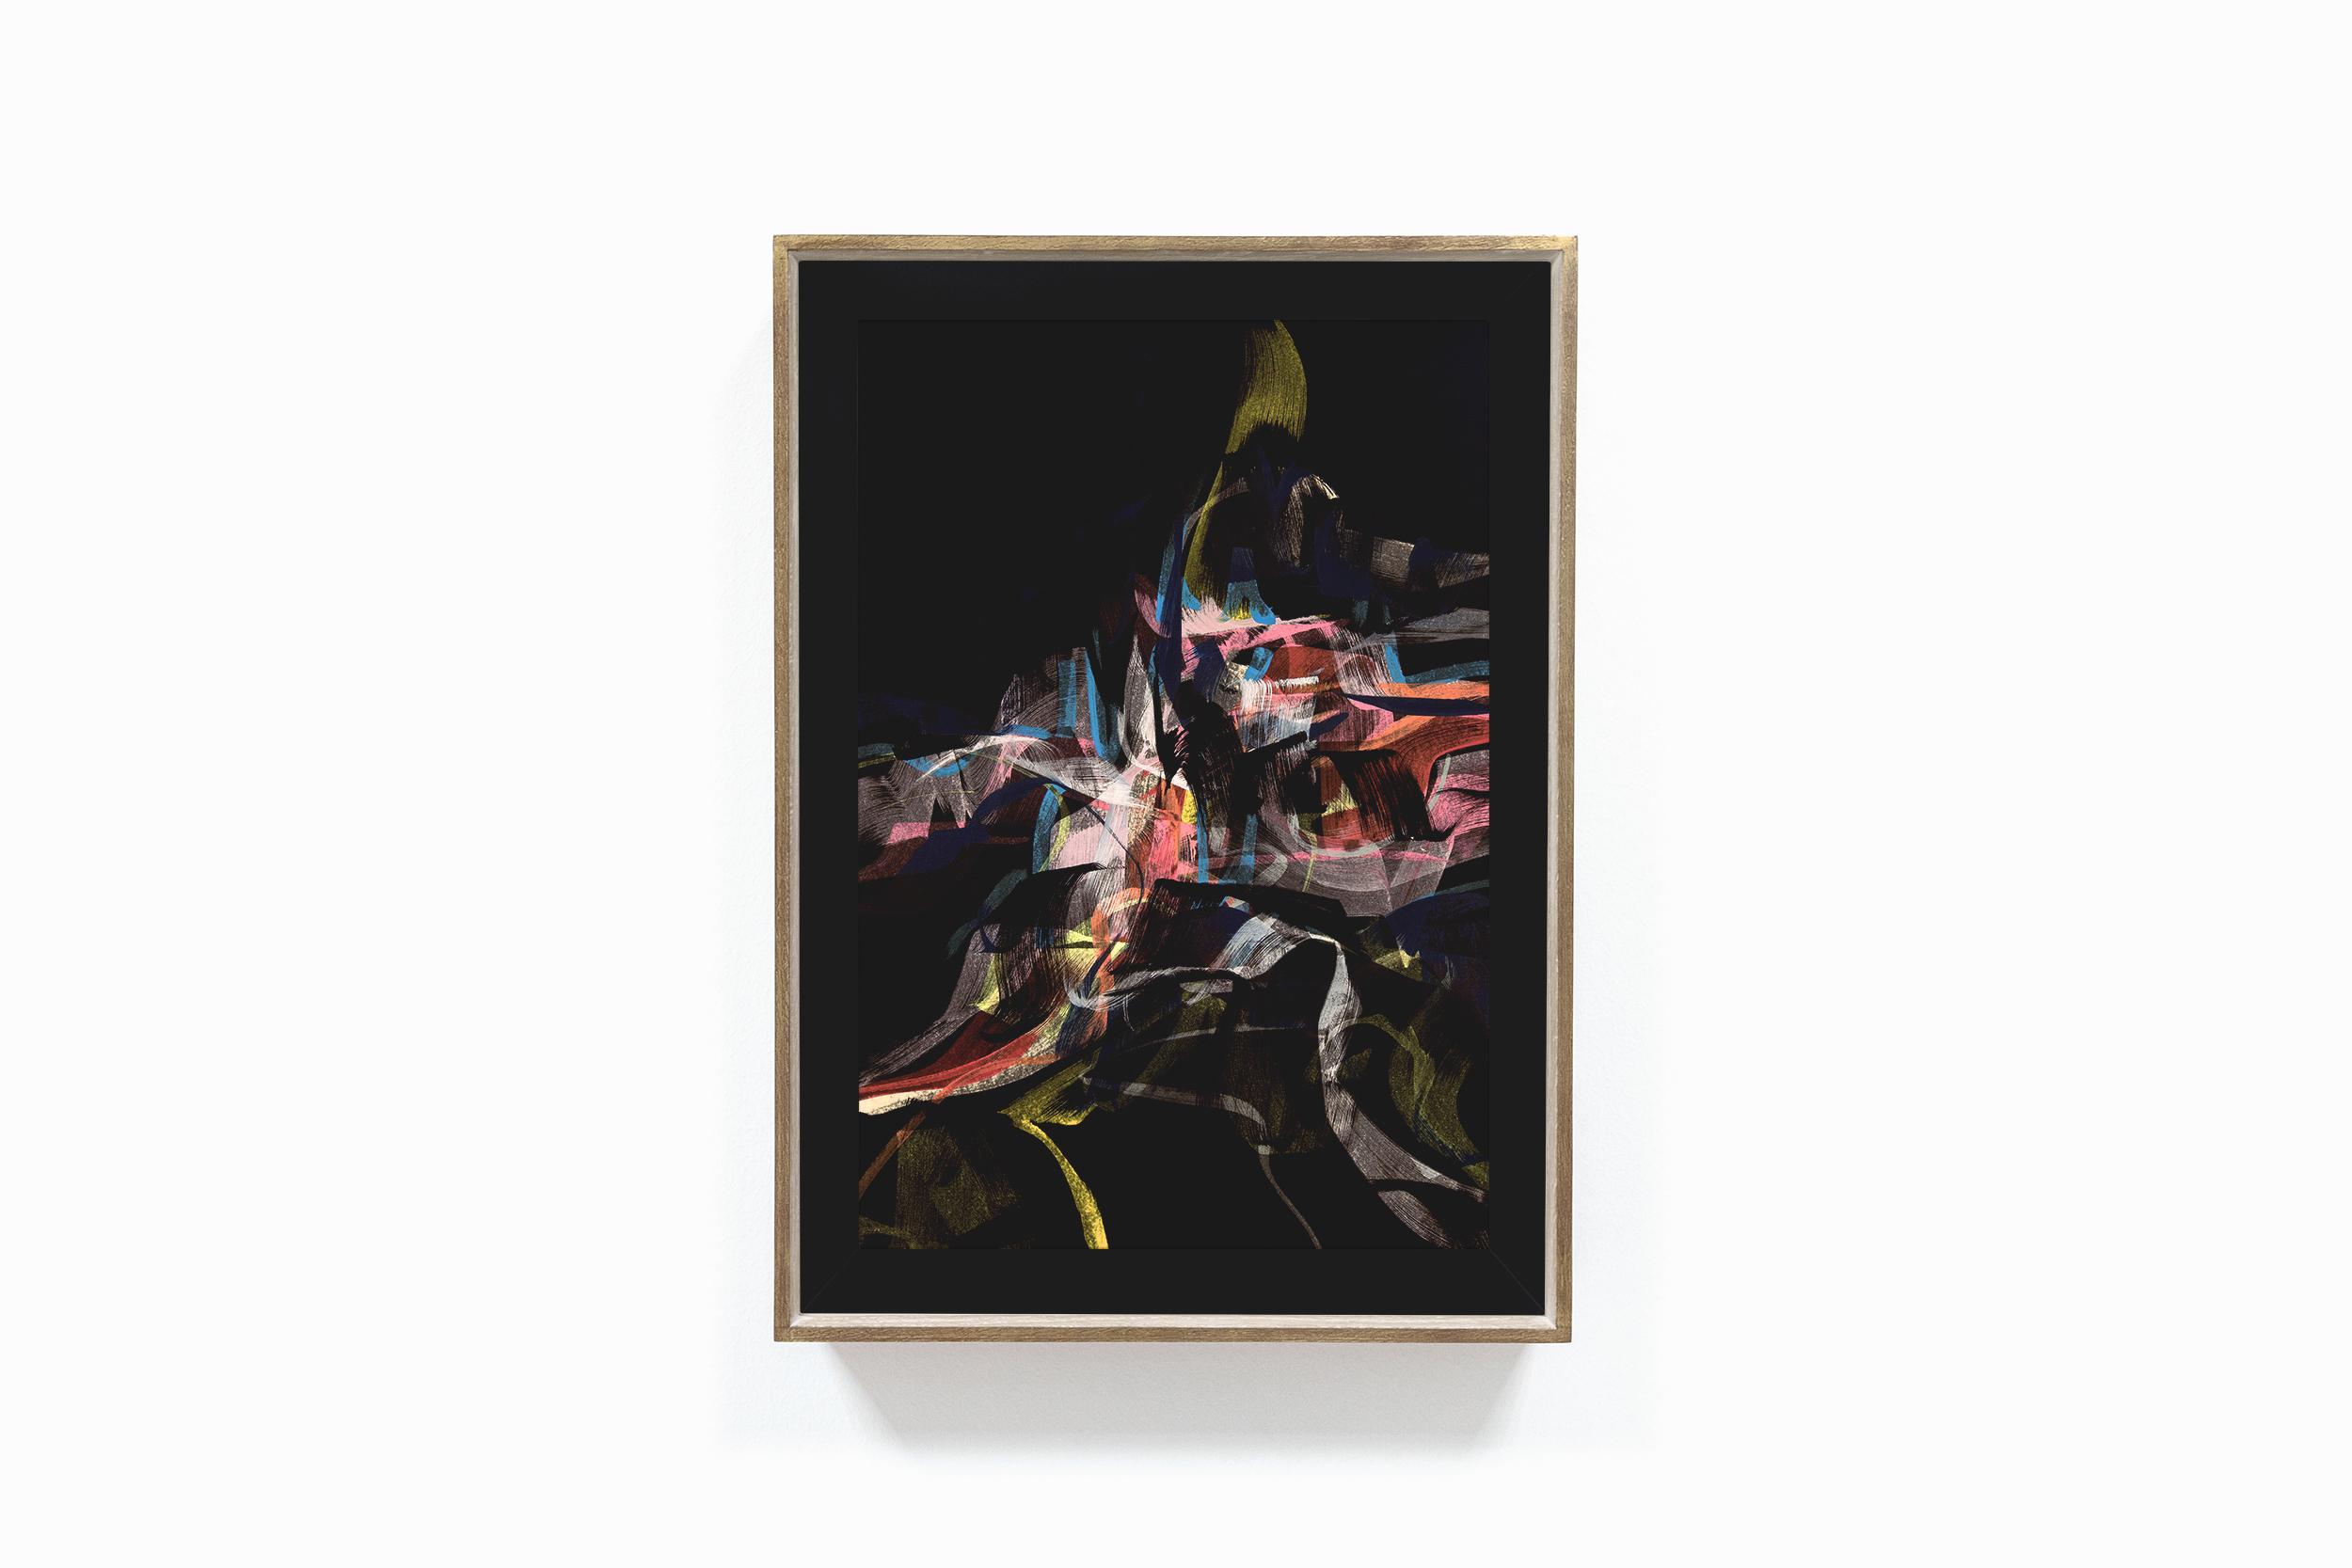 bonjourmolotov Deambulaia Illustration Ilustracao painting pintura acrylic acrílico canvas tela paper cardboard mdf Andre Gigante 17N2.jpg